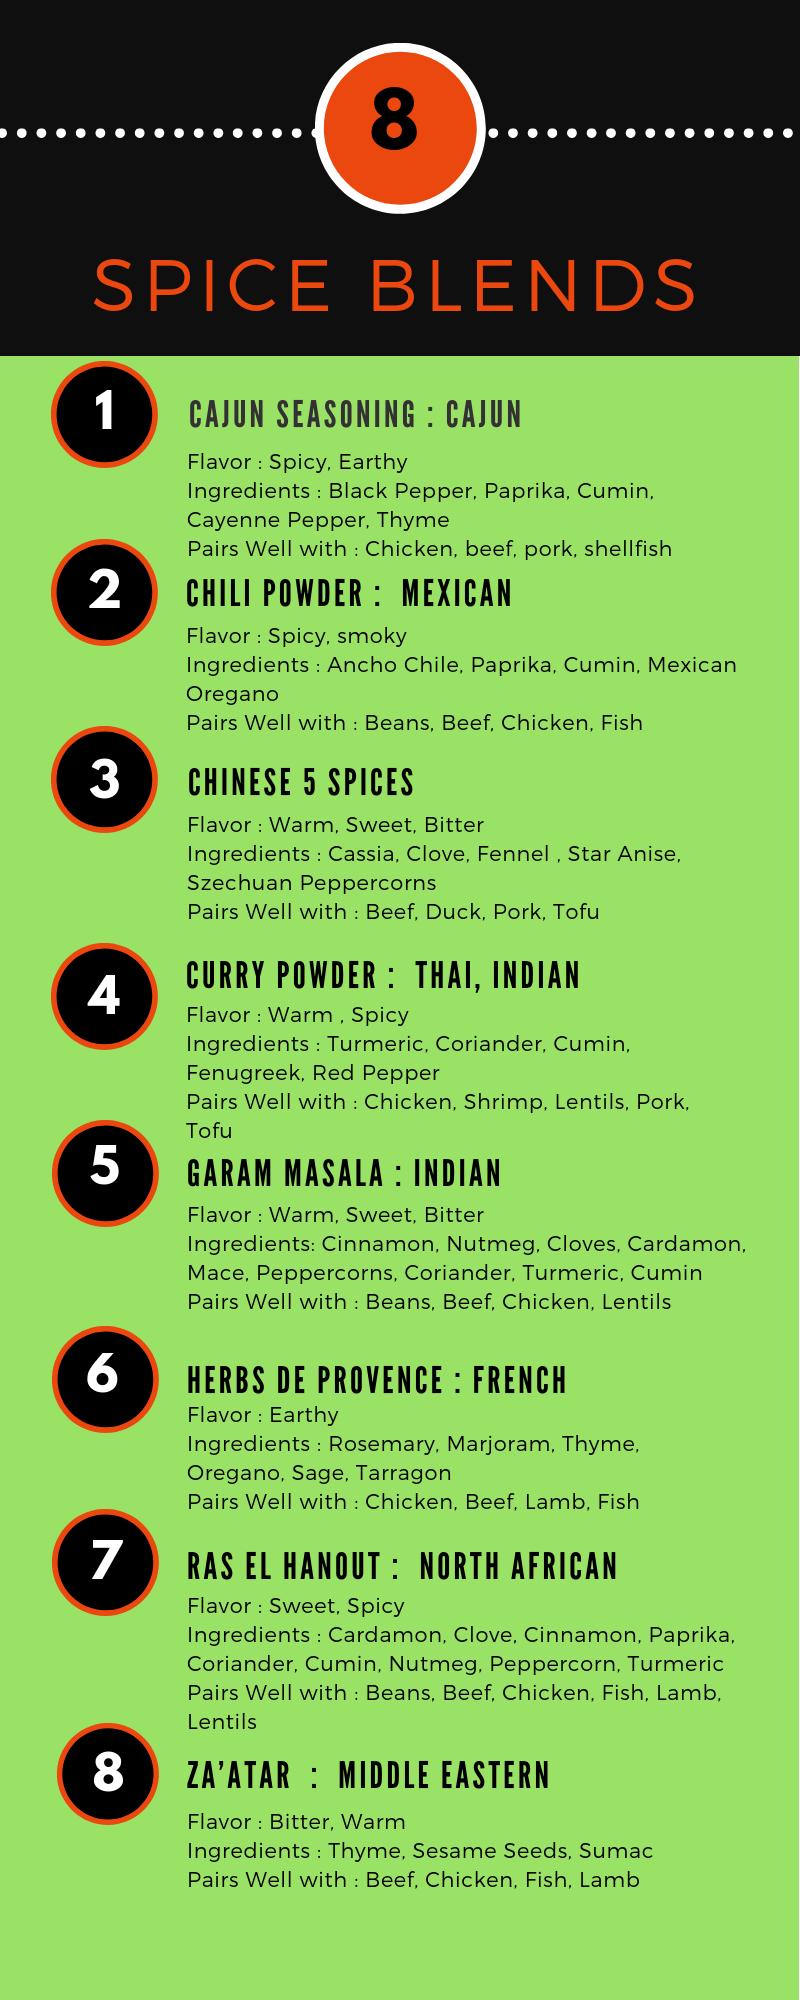 8 Spice Blends